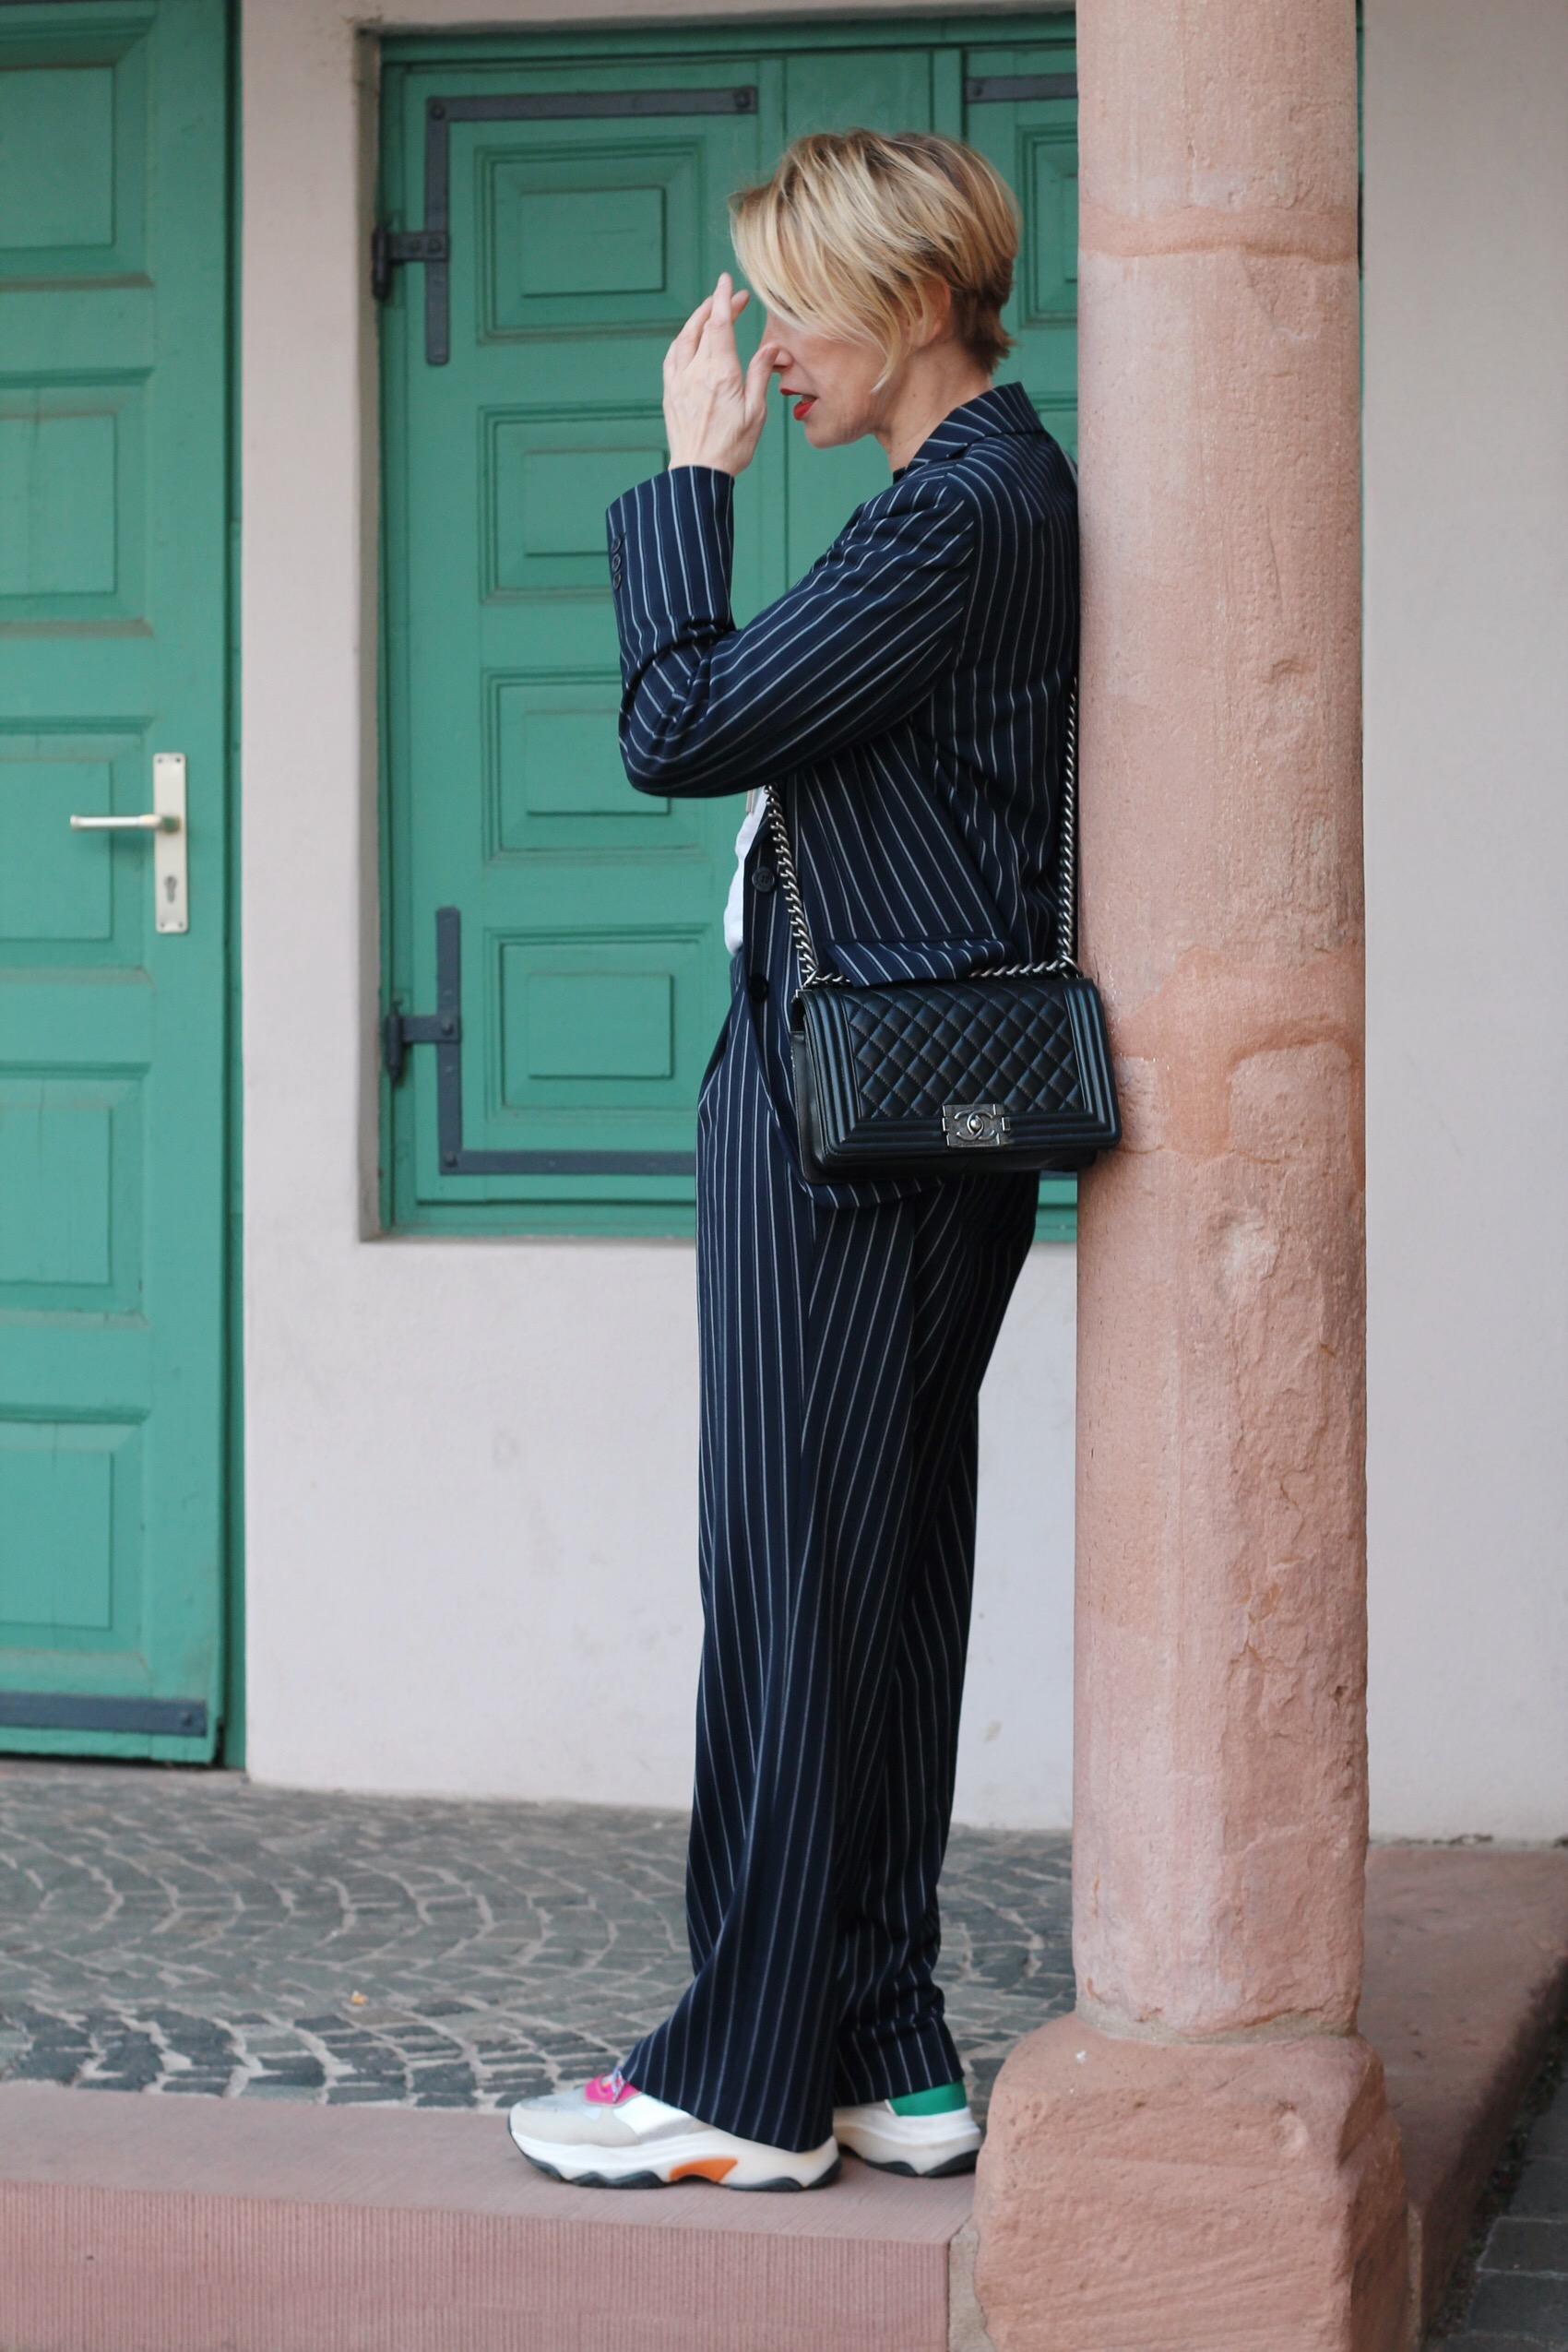 glamupyourlifestyle nadelstreifen Hosenanzug Damenanzug Nadelstreifen-Anzug Büro-Outfit ü-40-blog ü-50-blog ue-50-blog Modeblog